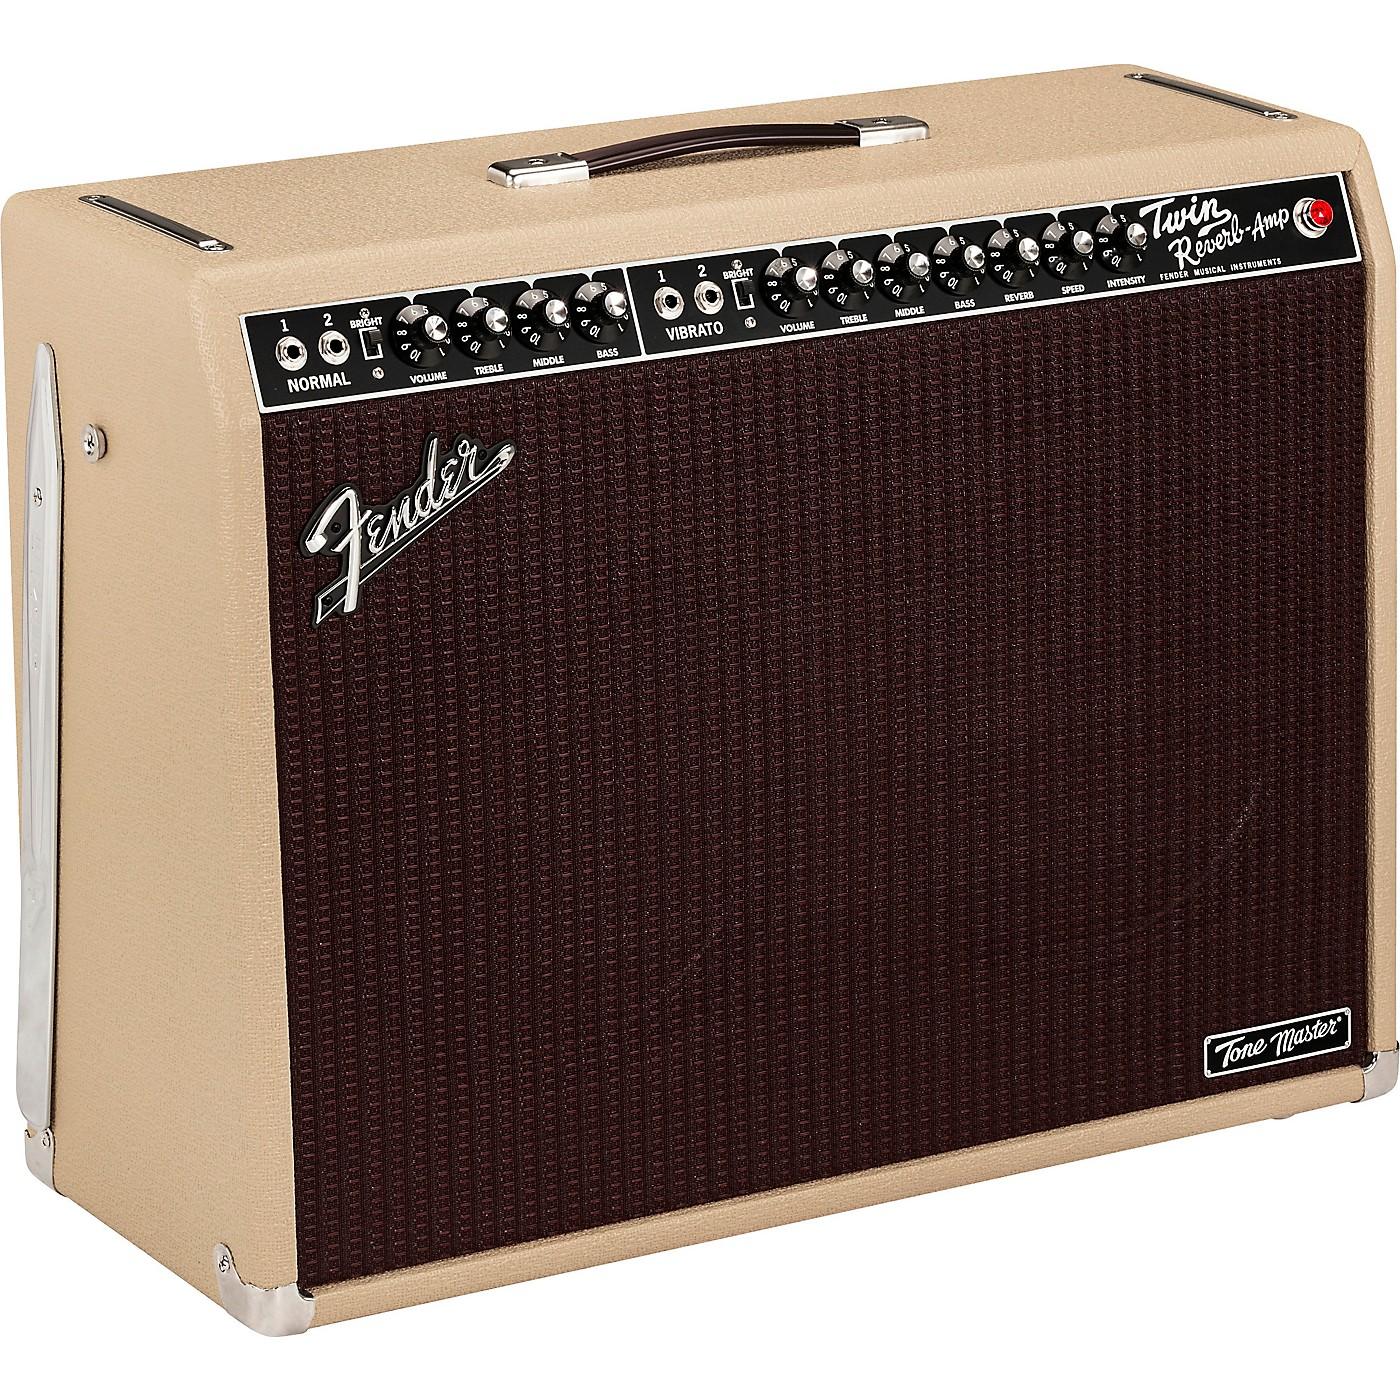 Fender Tone Master Twin Reverb 100W 2x12 Celestion NEO Creamback Amplifier thumbnail